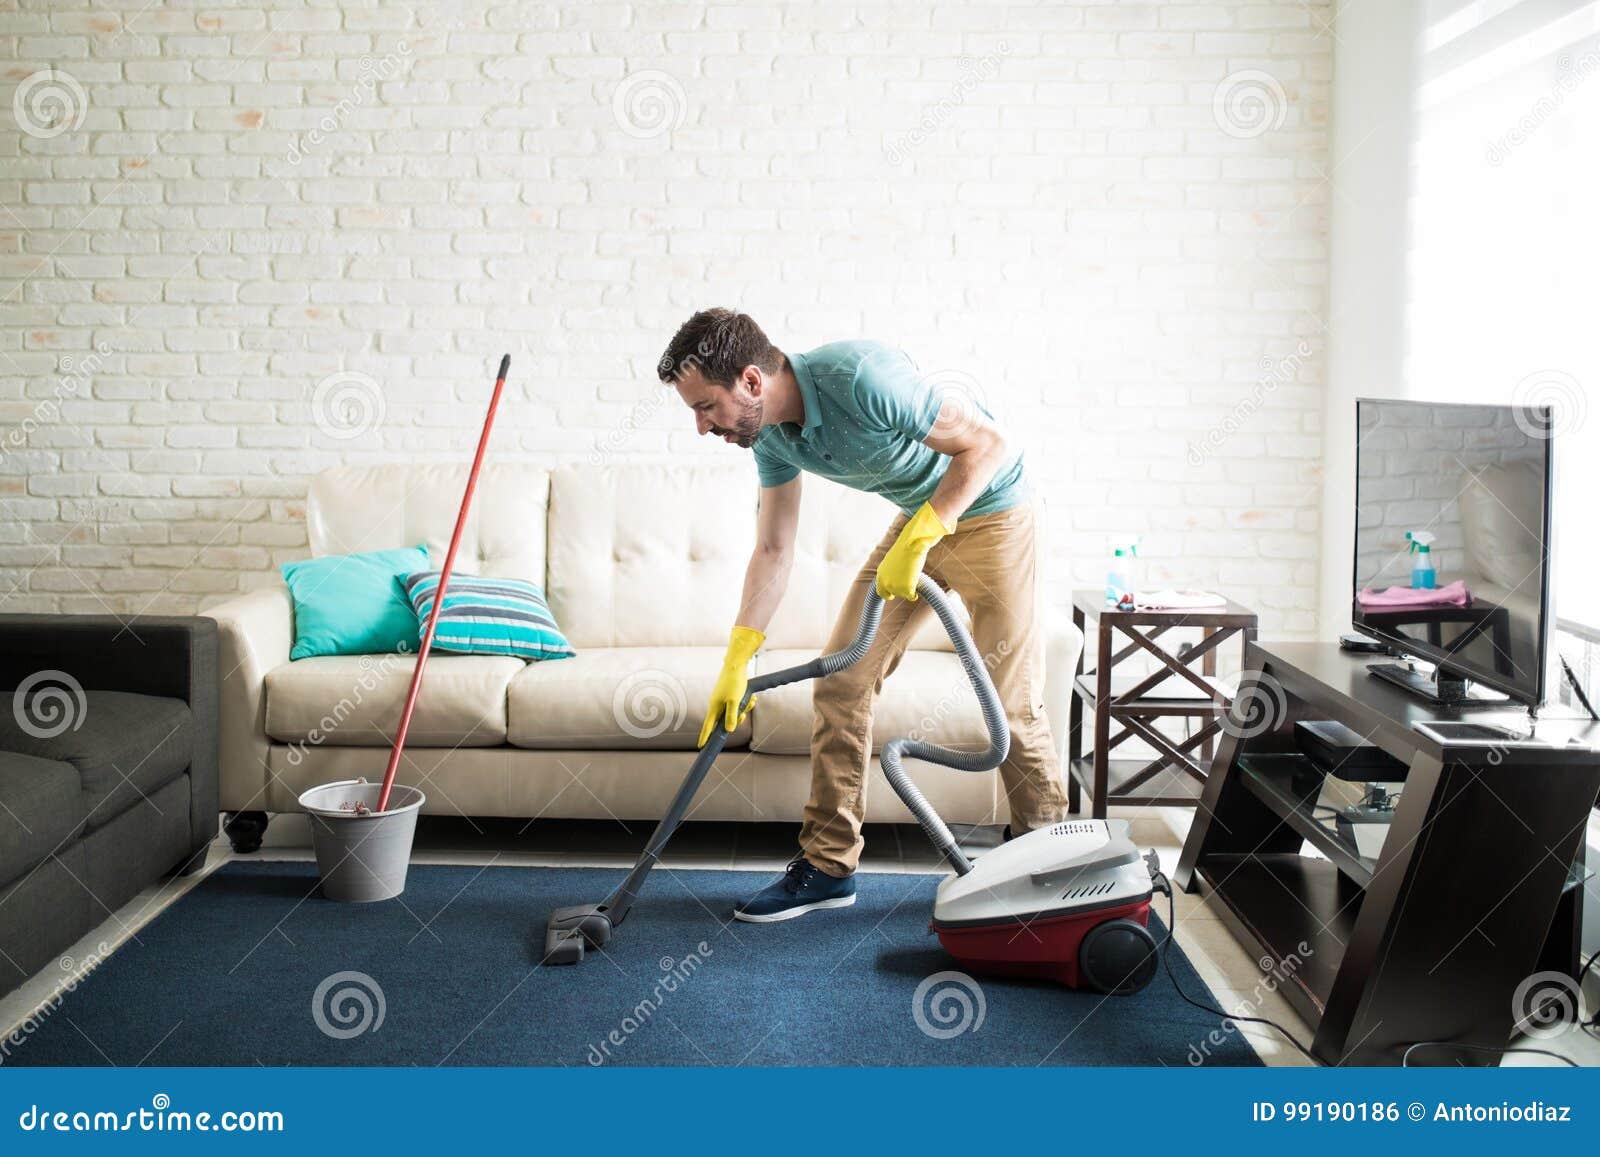 Hispanic man vacuuming the living room